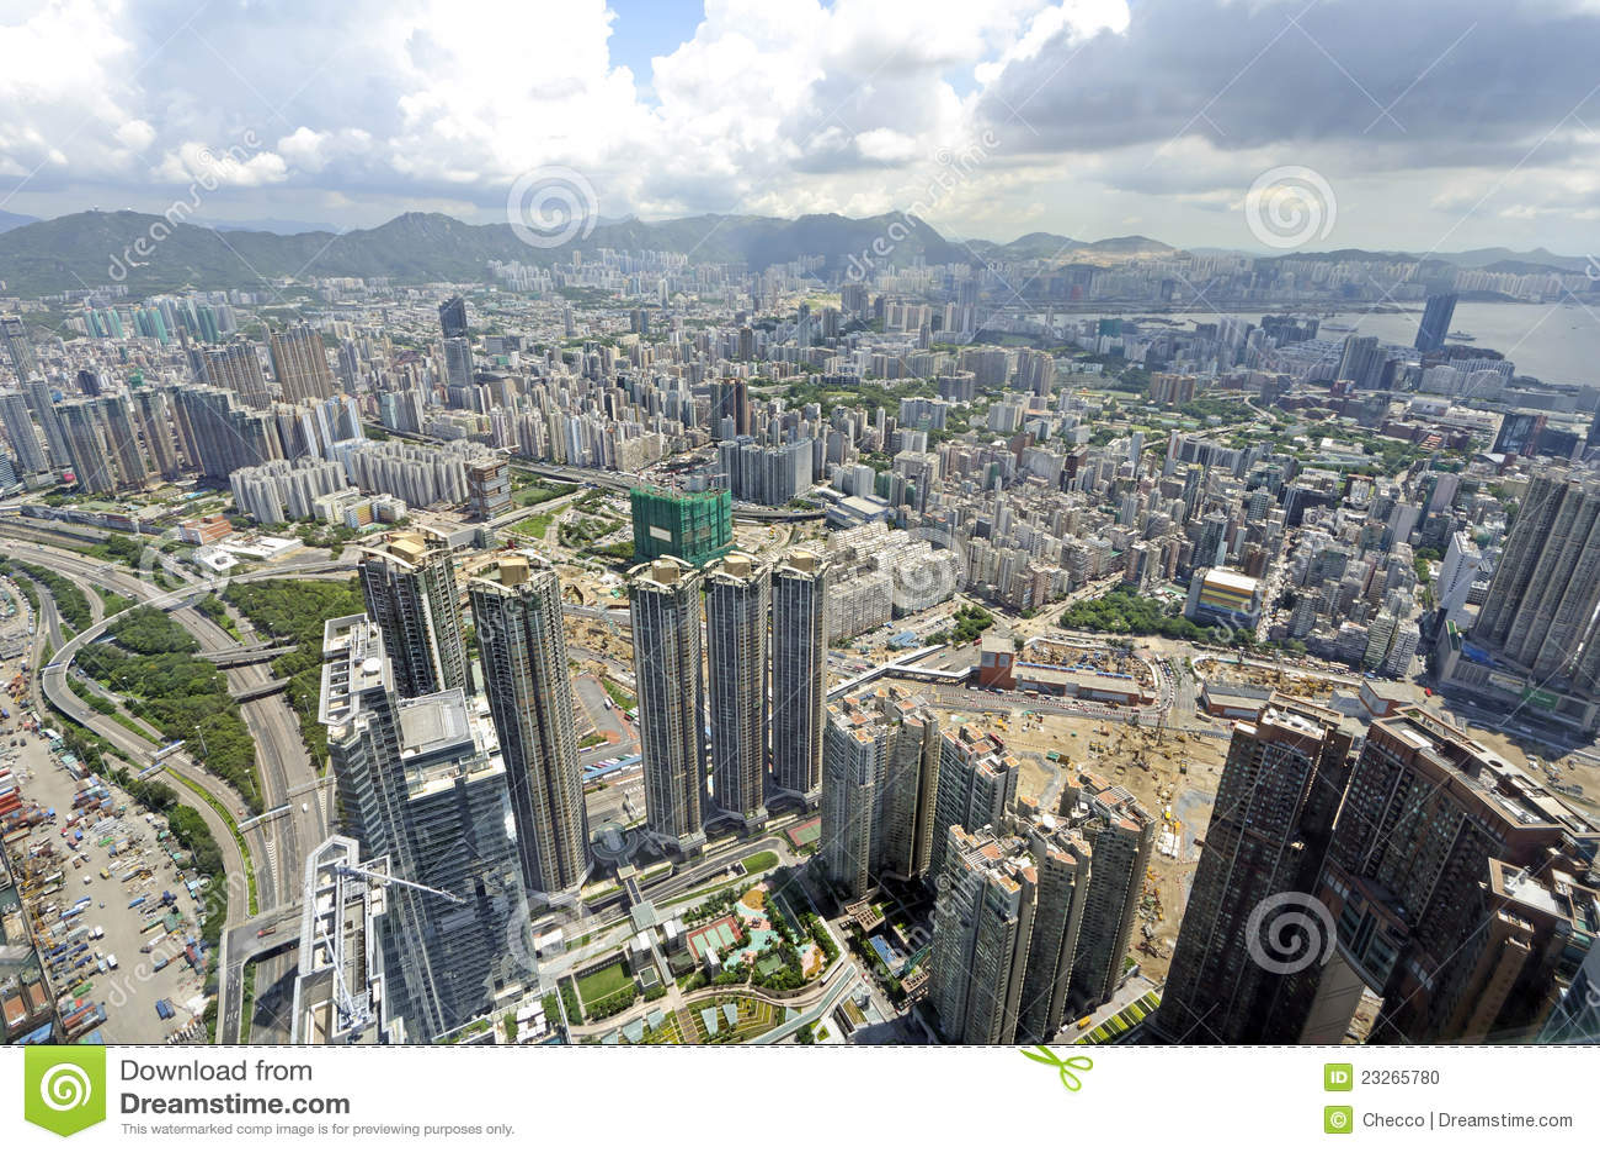 The Evolving Urban Form: Hong Kong